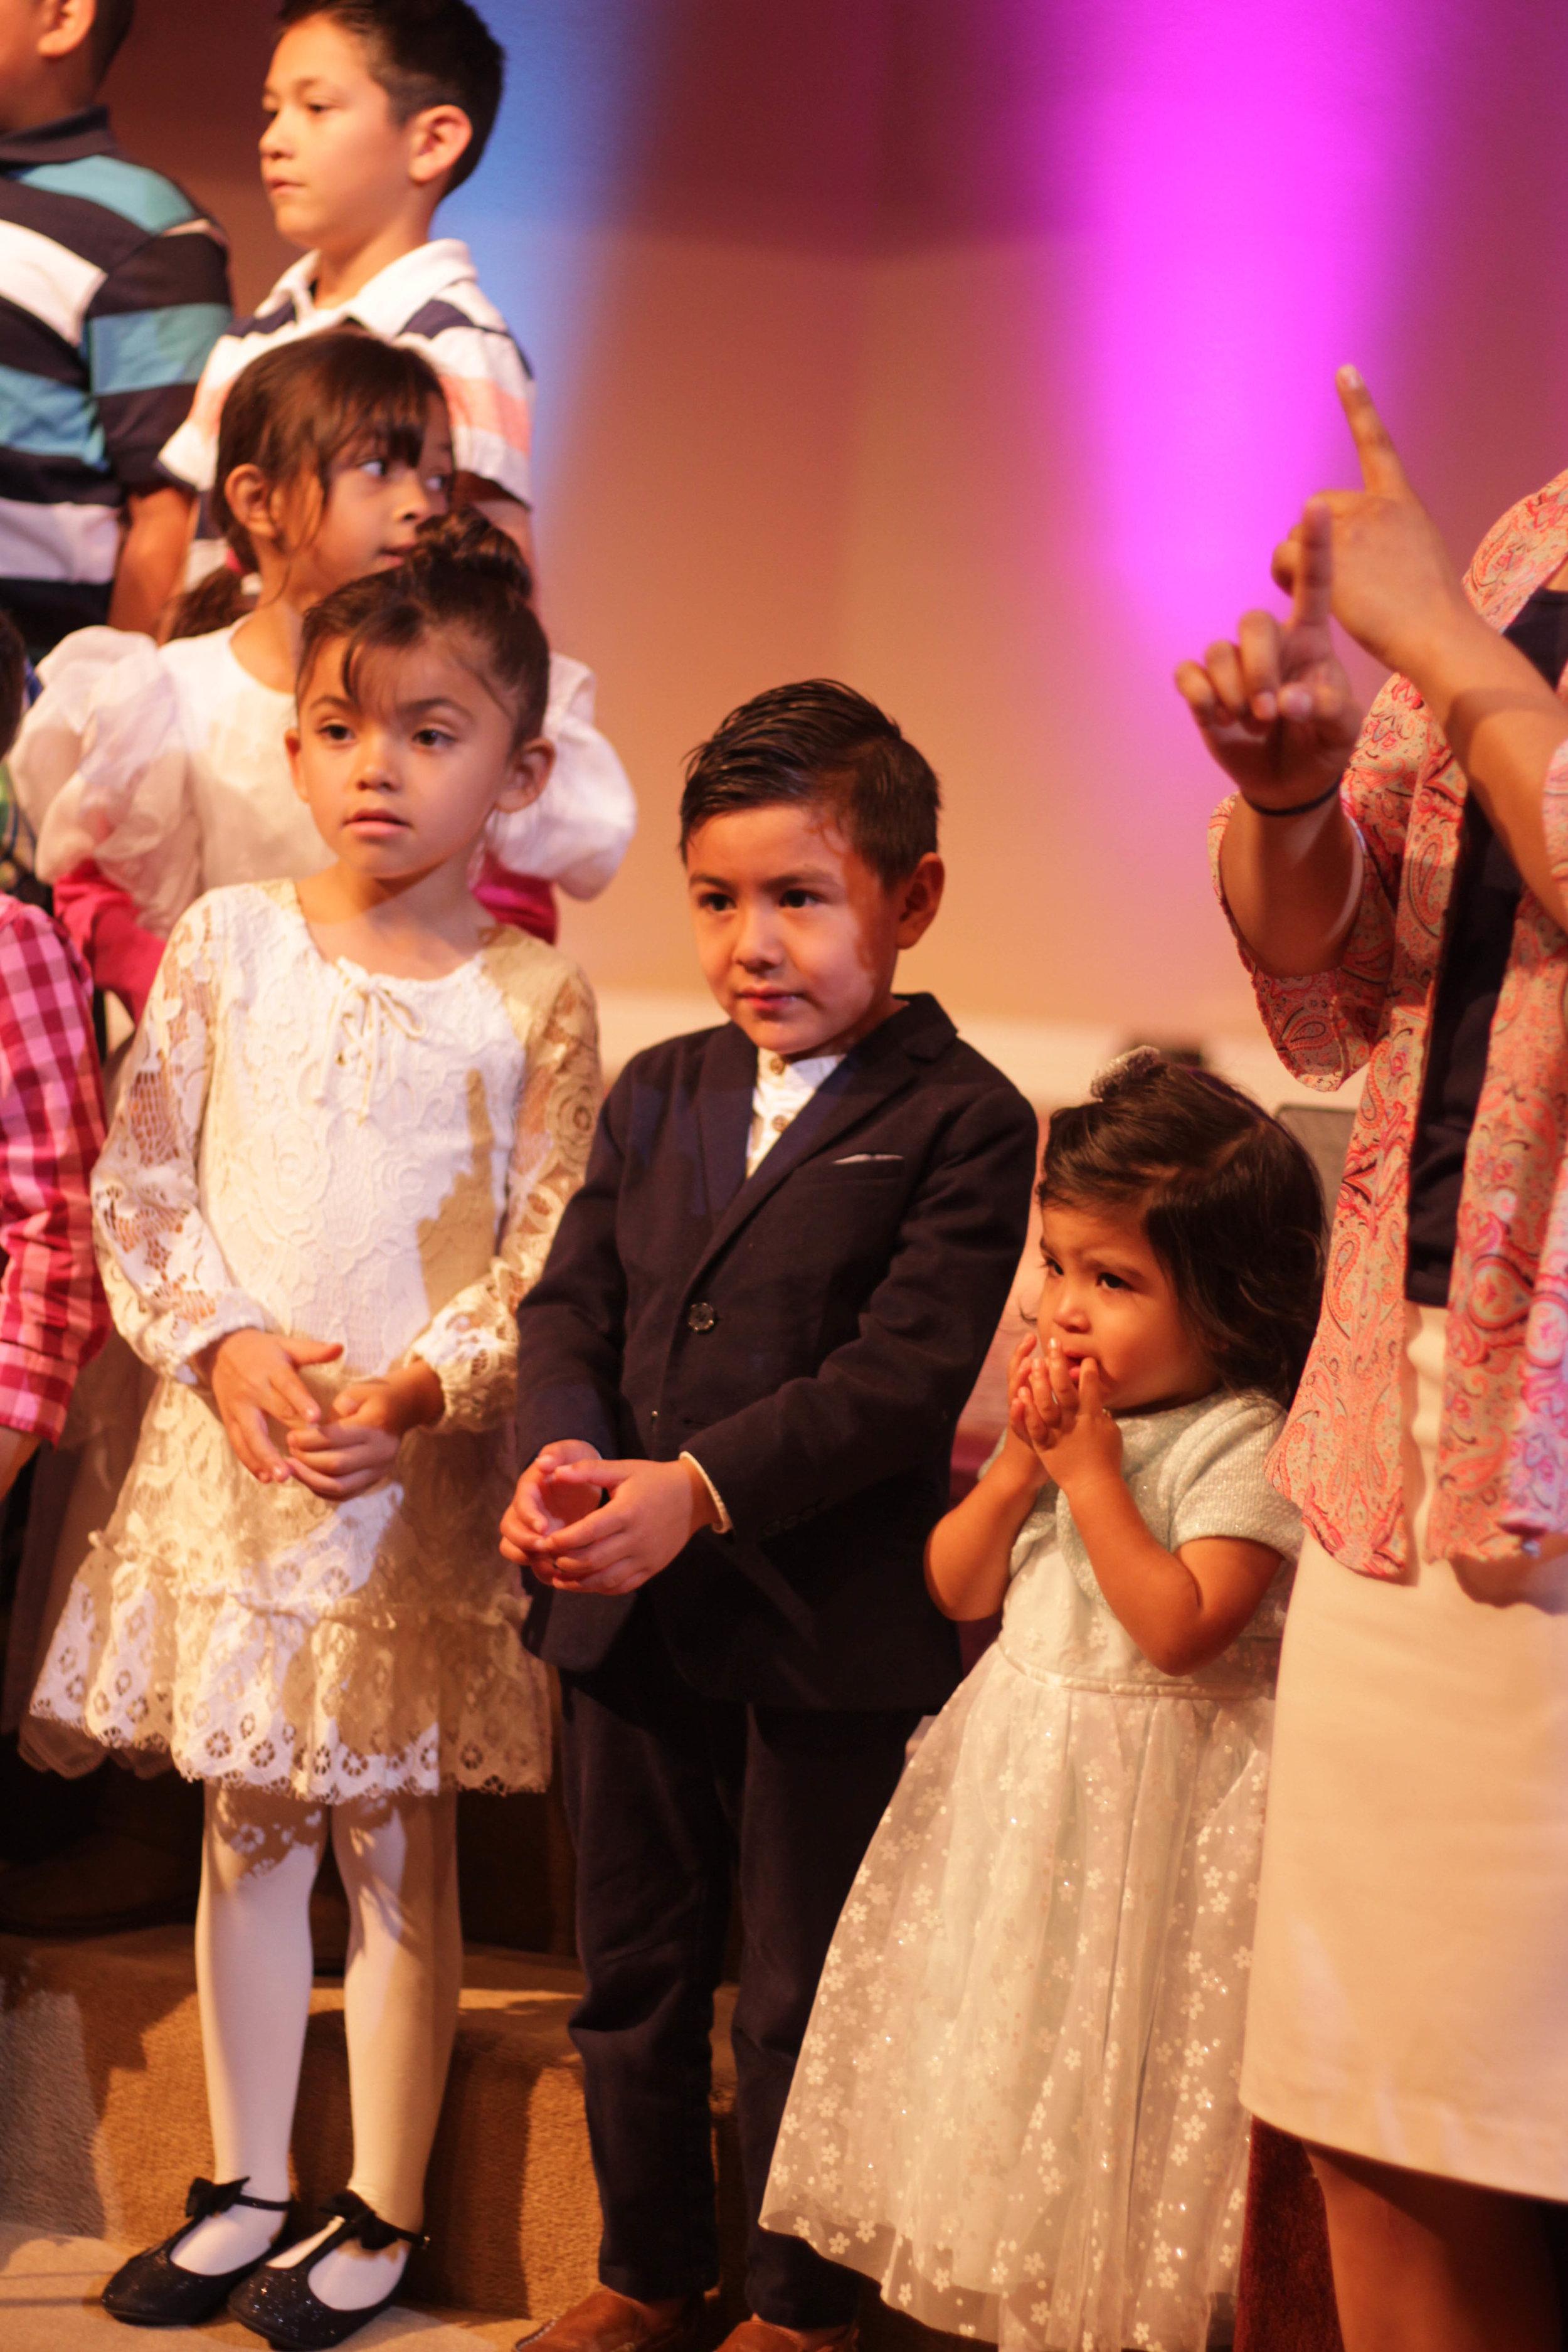 Judah singing with his church kids choir